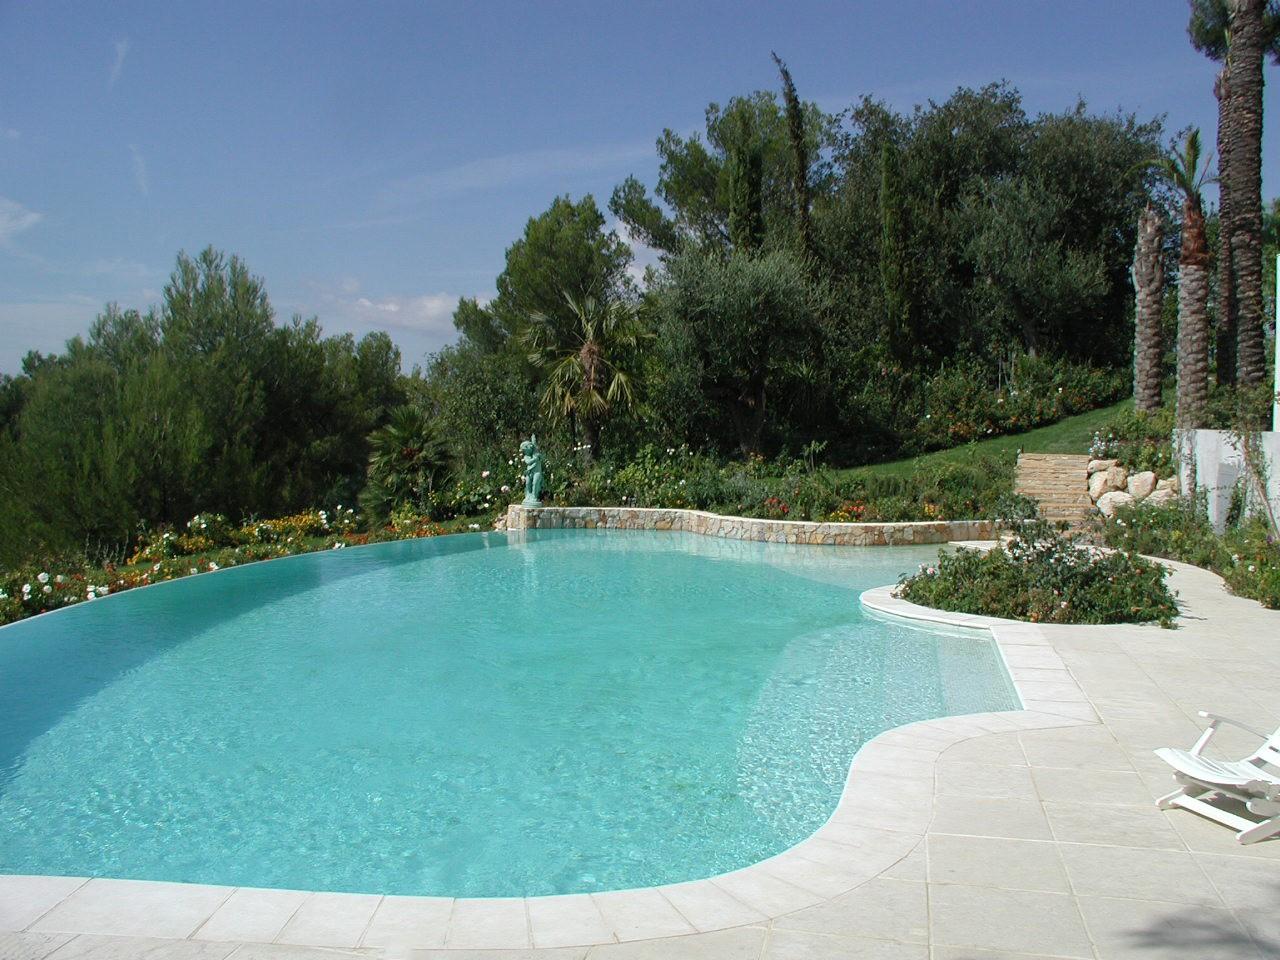 Pool embraced by the green - حمامات السباحة